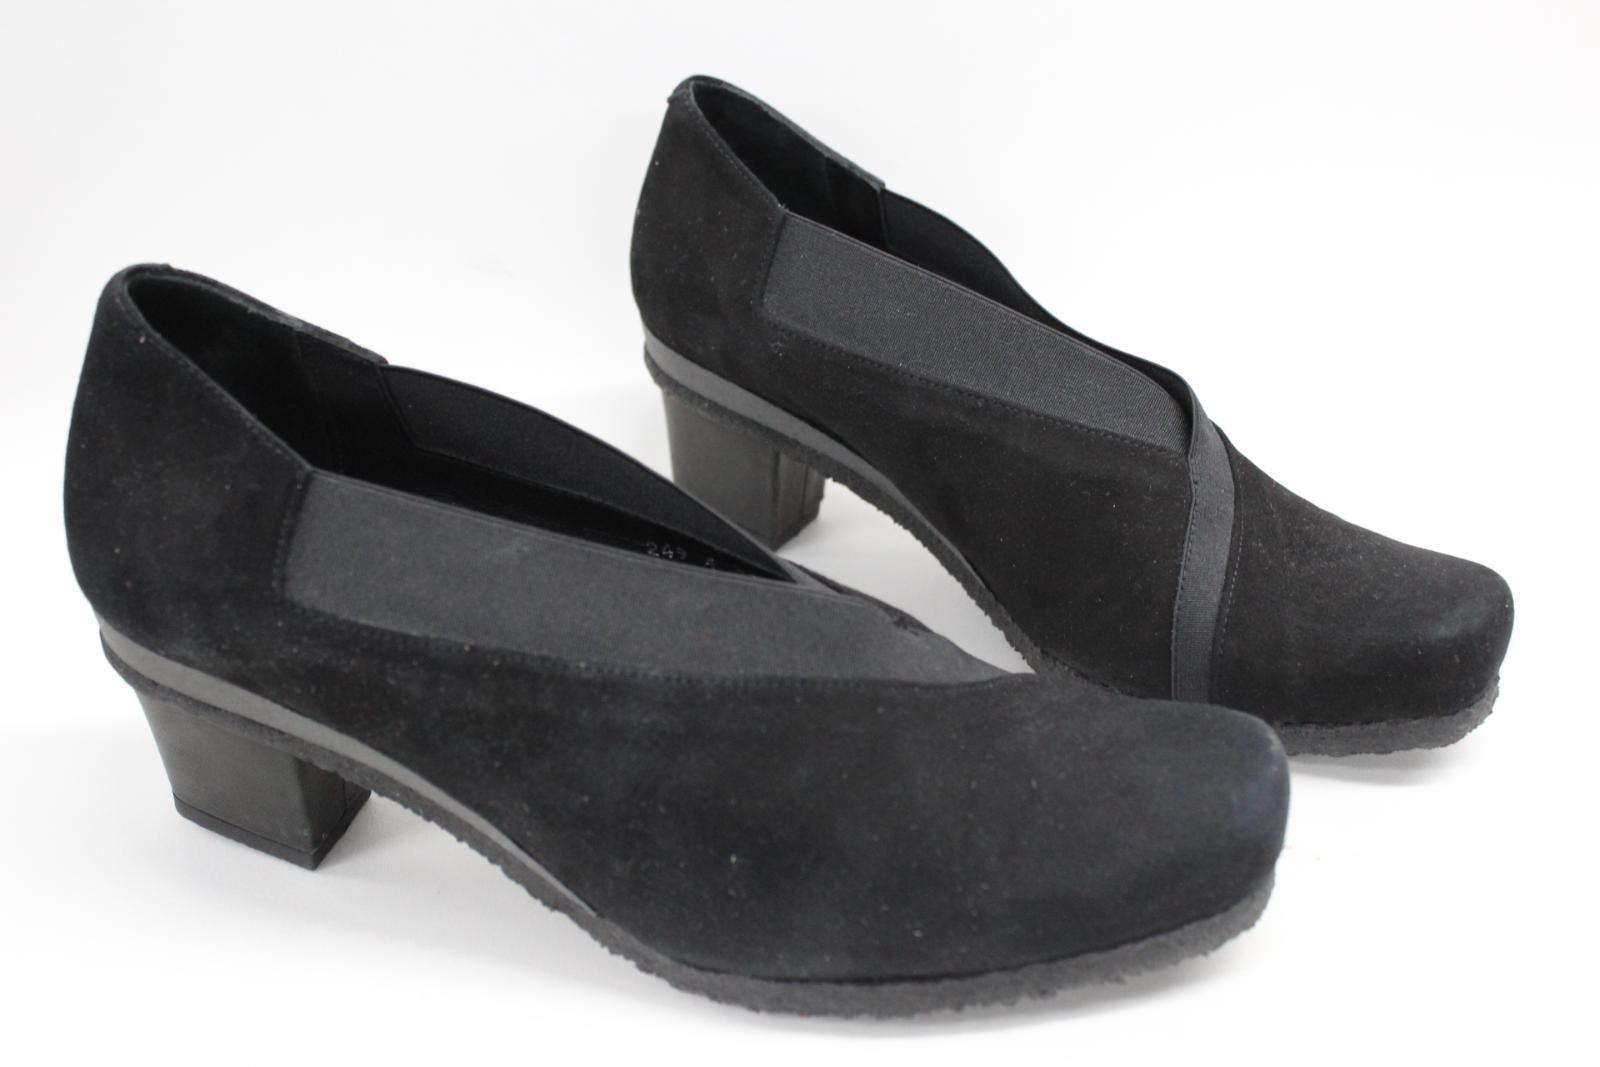 AUDLEY-London-Ladies-Black-Suede-Crossover-Block-Heels-Shoes-Size-EU39-UK6 thumbnail 12